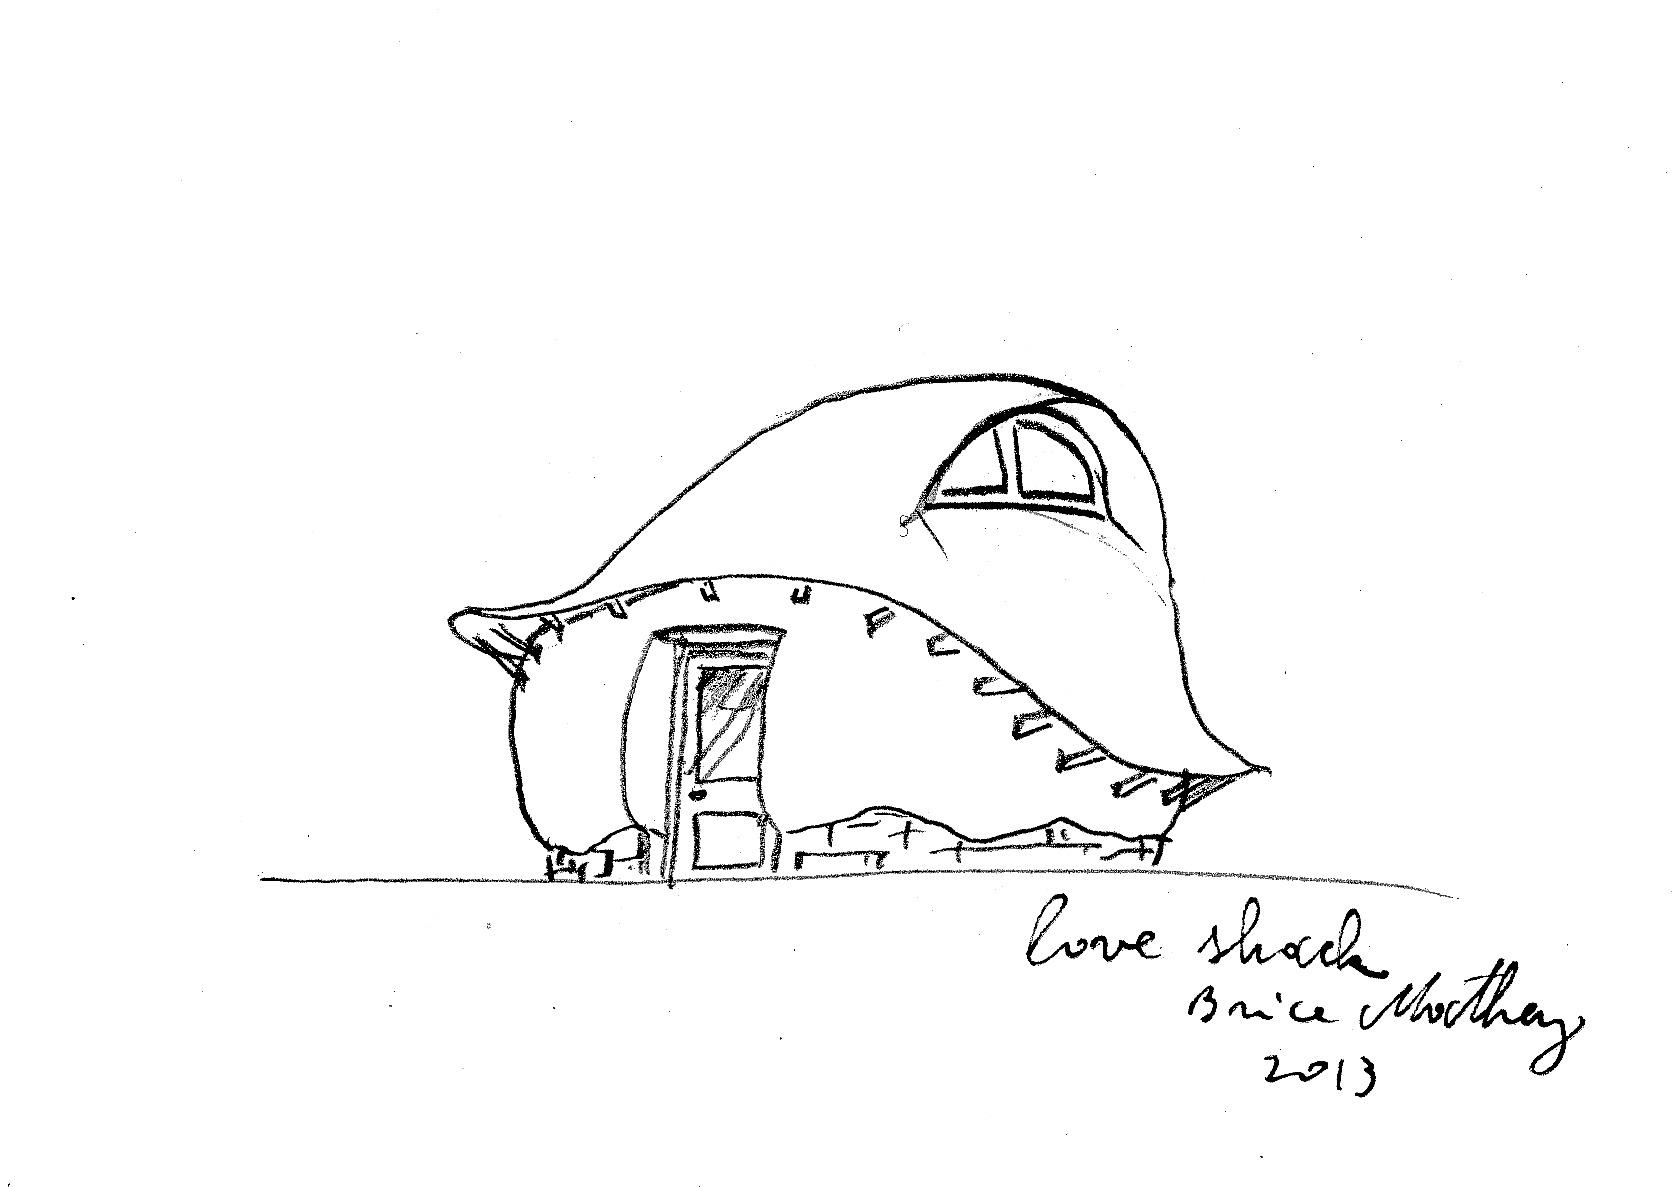 love shack sketch4